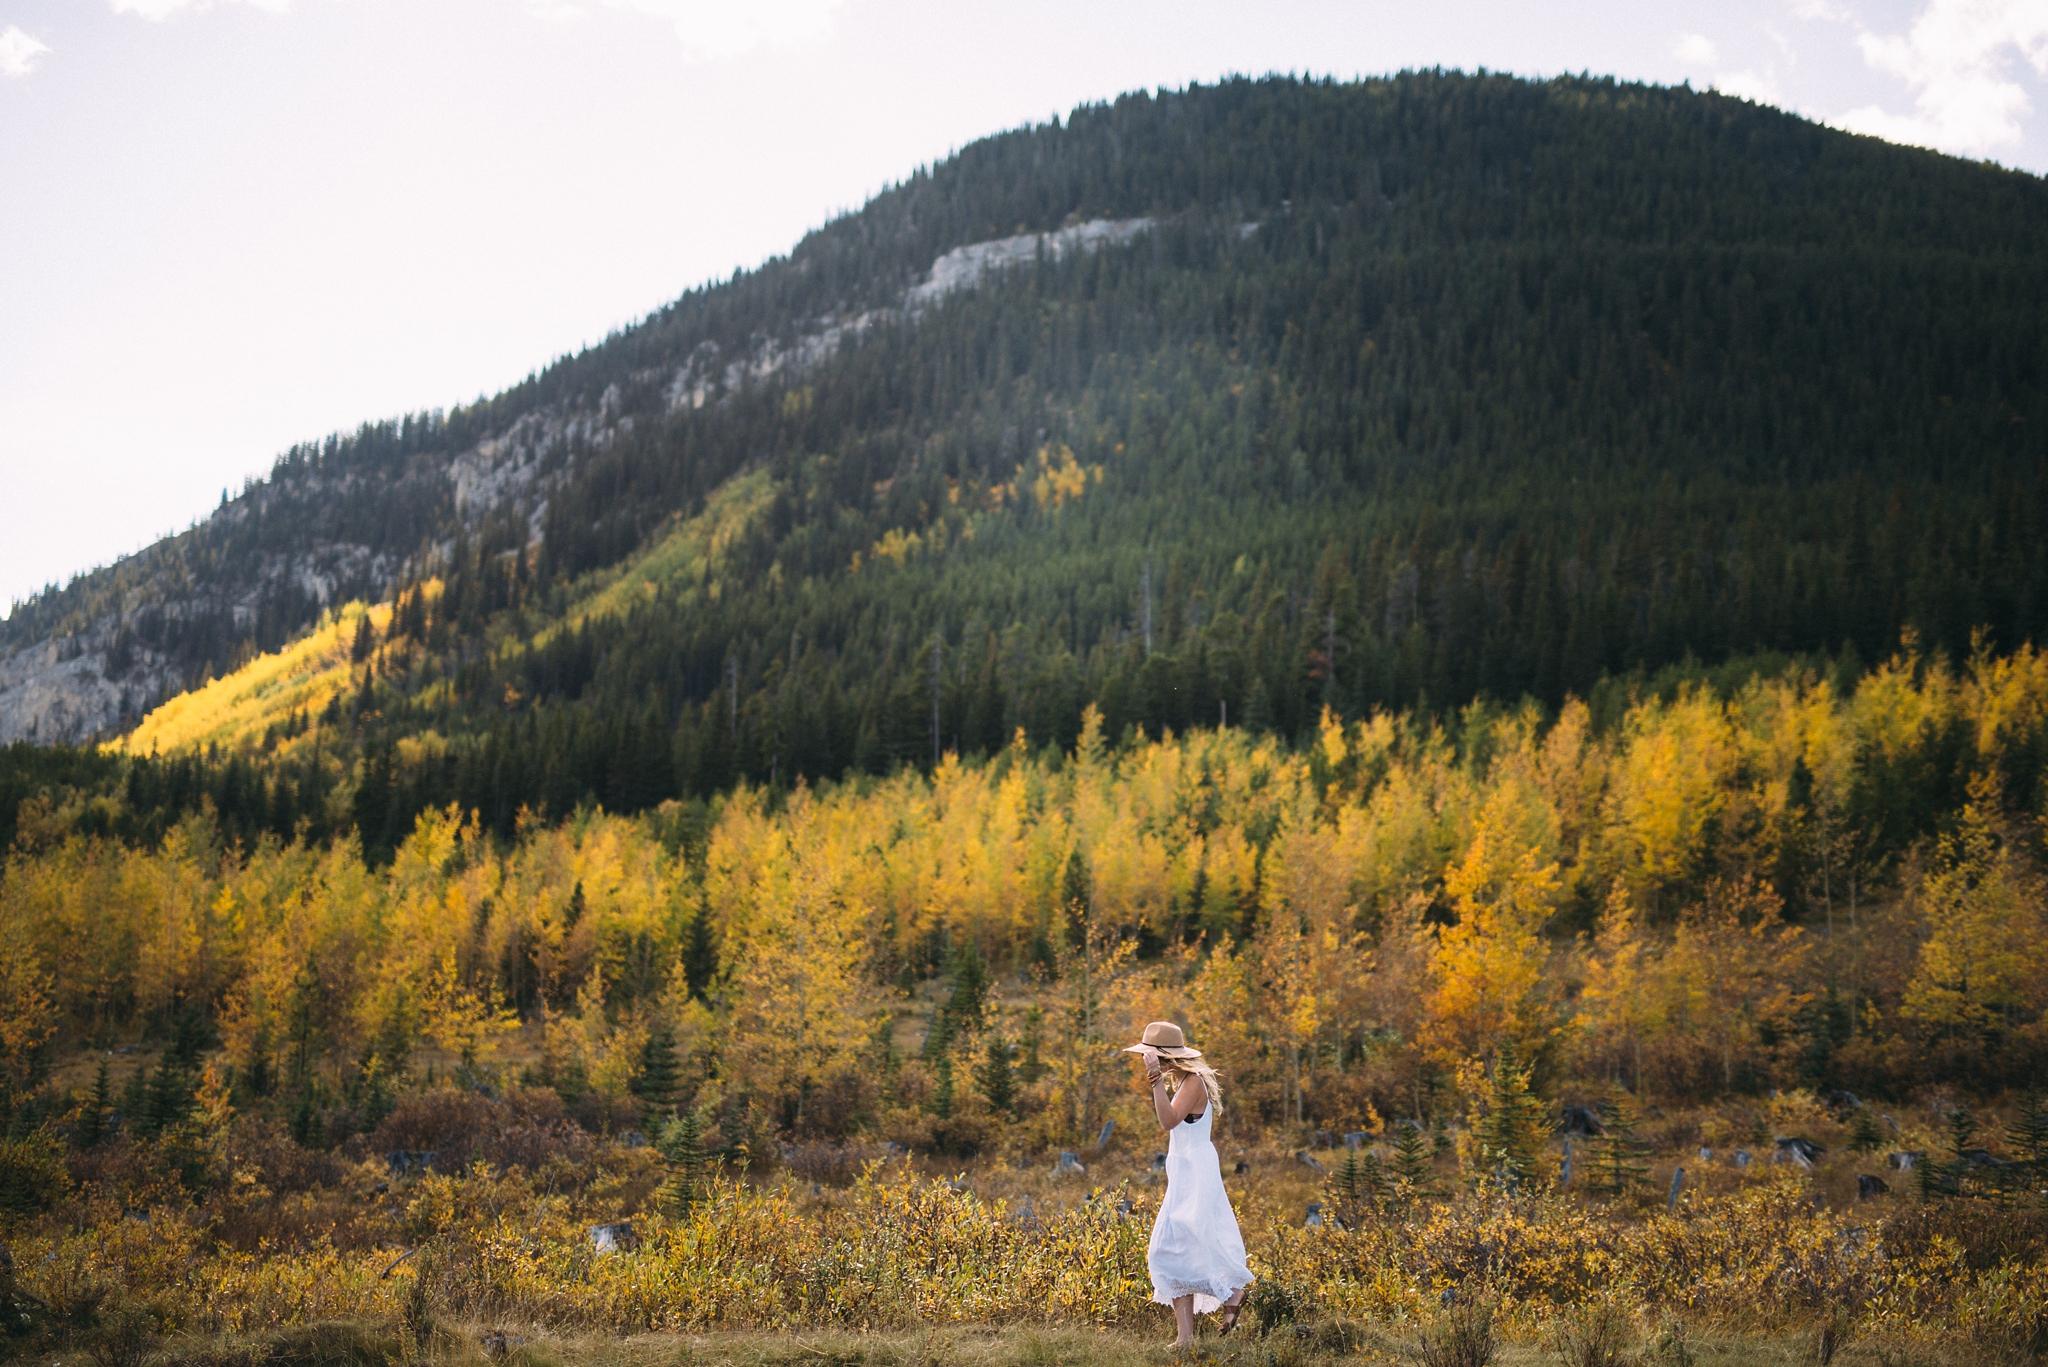 kaihla_tonai_intimate_wedding_elopement_photographer_3295